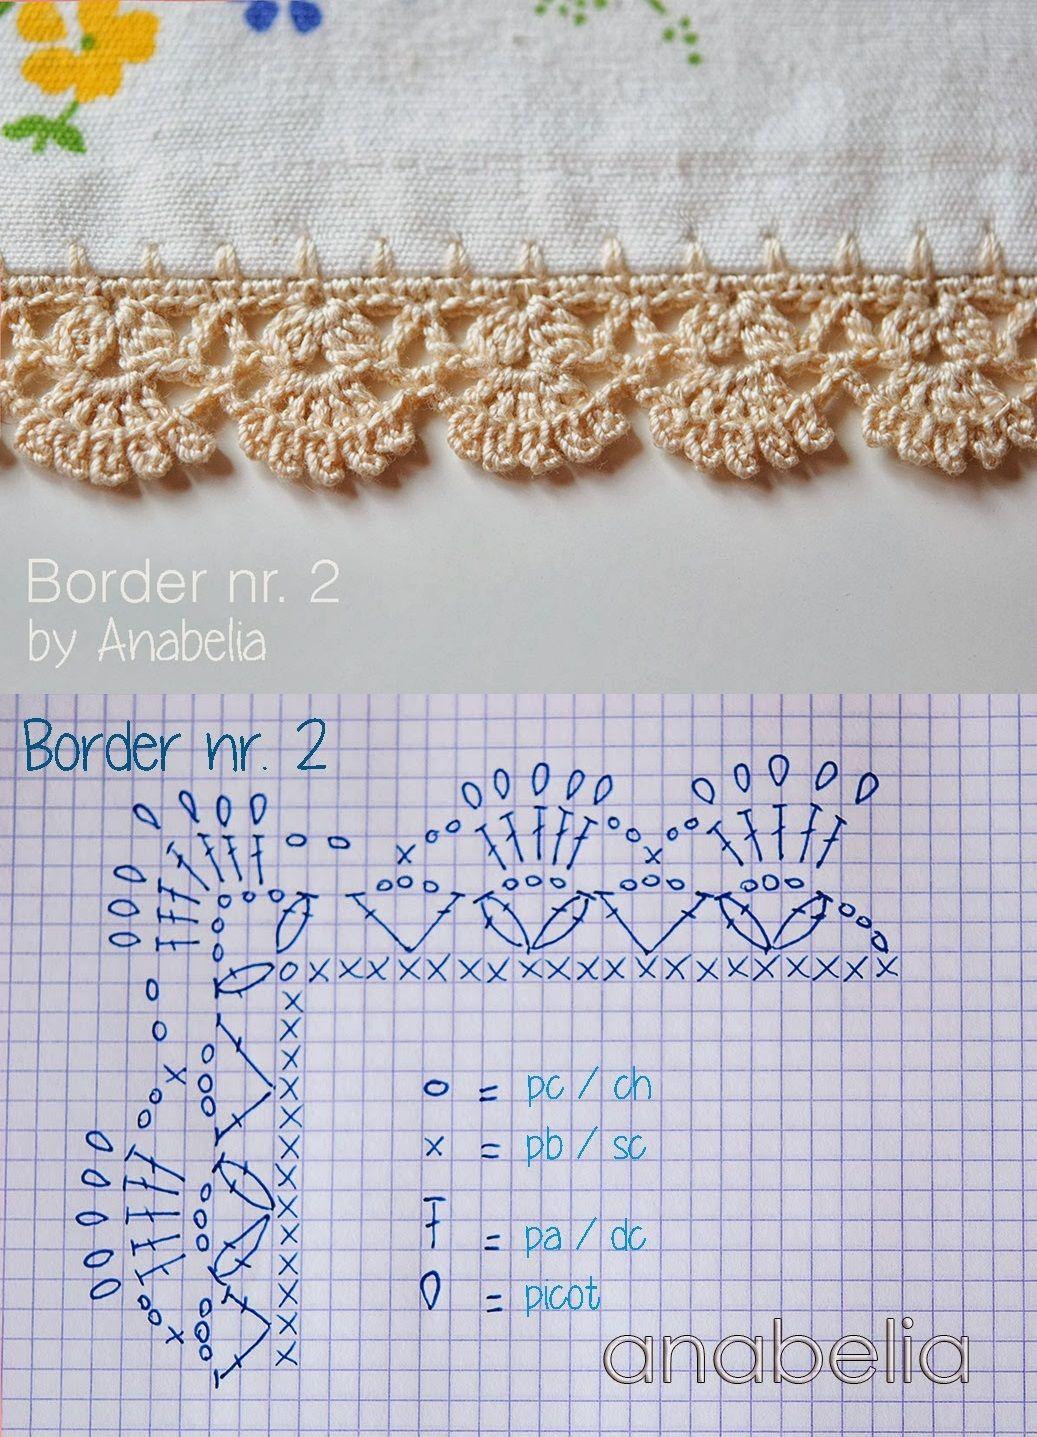 Crochet Edge Chart 4u Hf Crochet Pinterest Häkeln